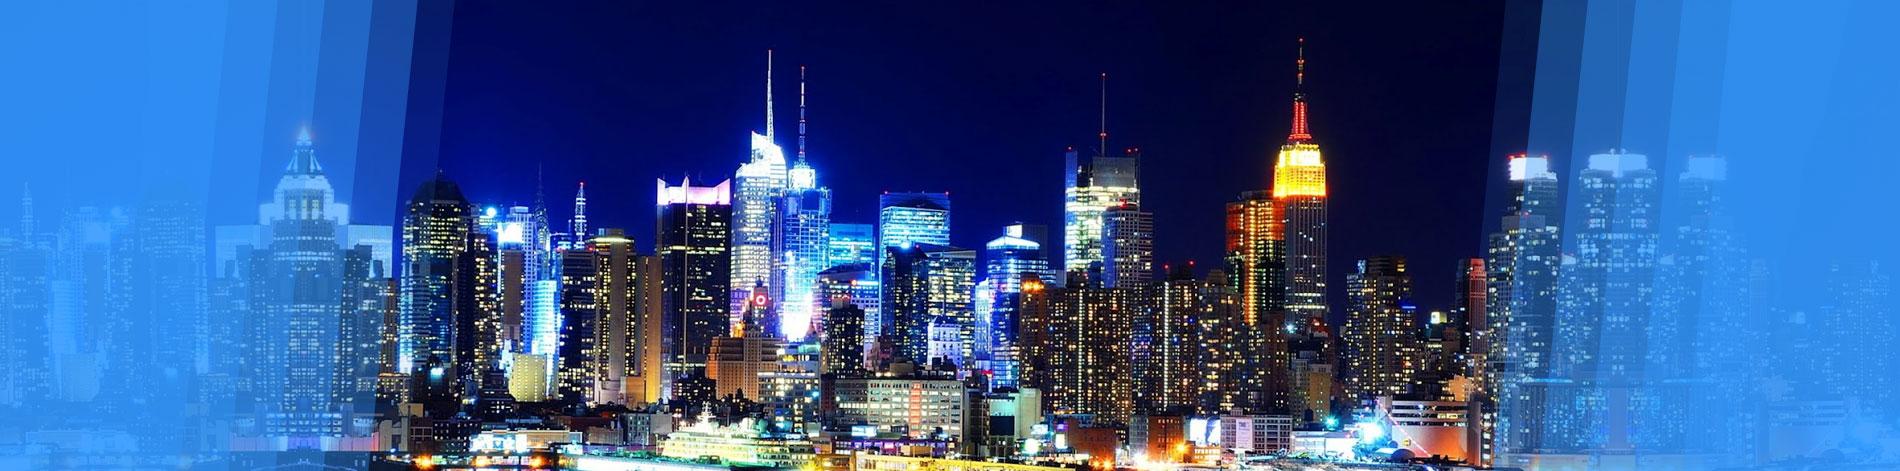 newyorkbleu4